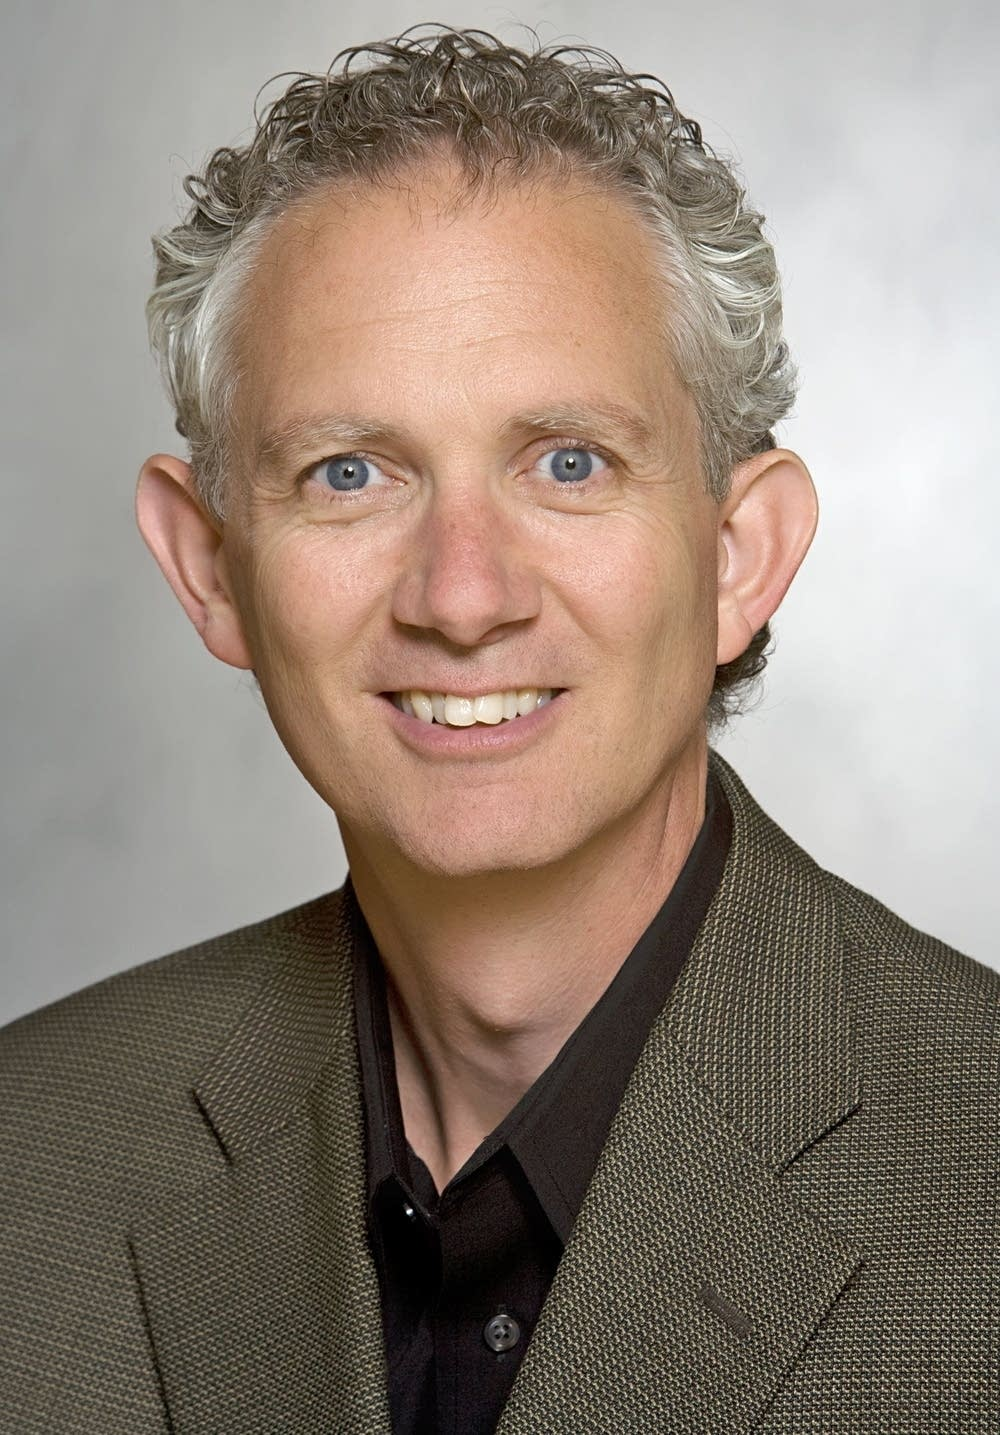 Jerry Luckhardt